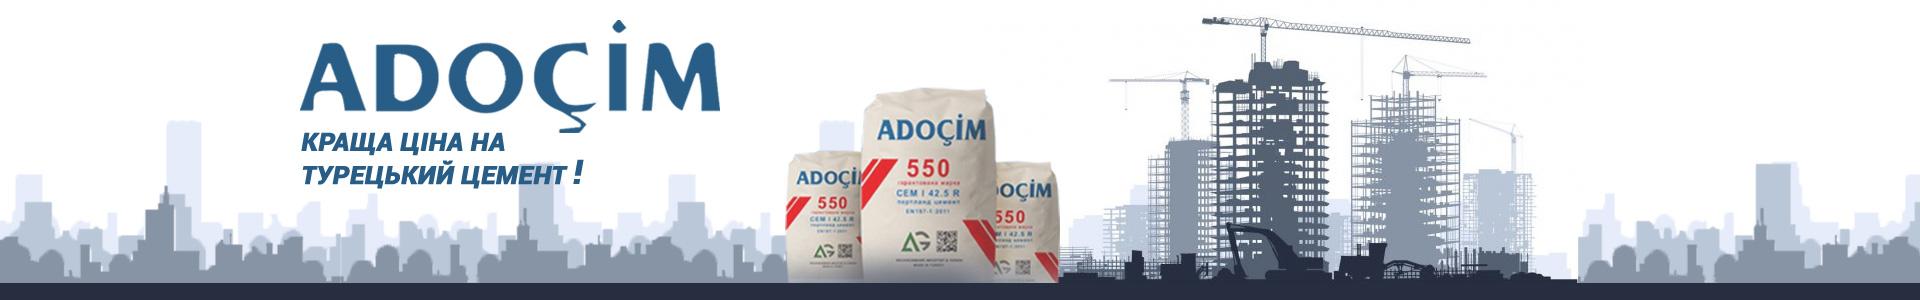 brand_adocim